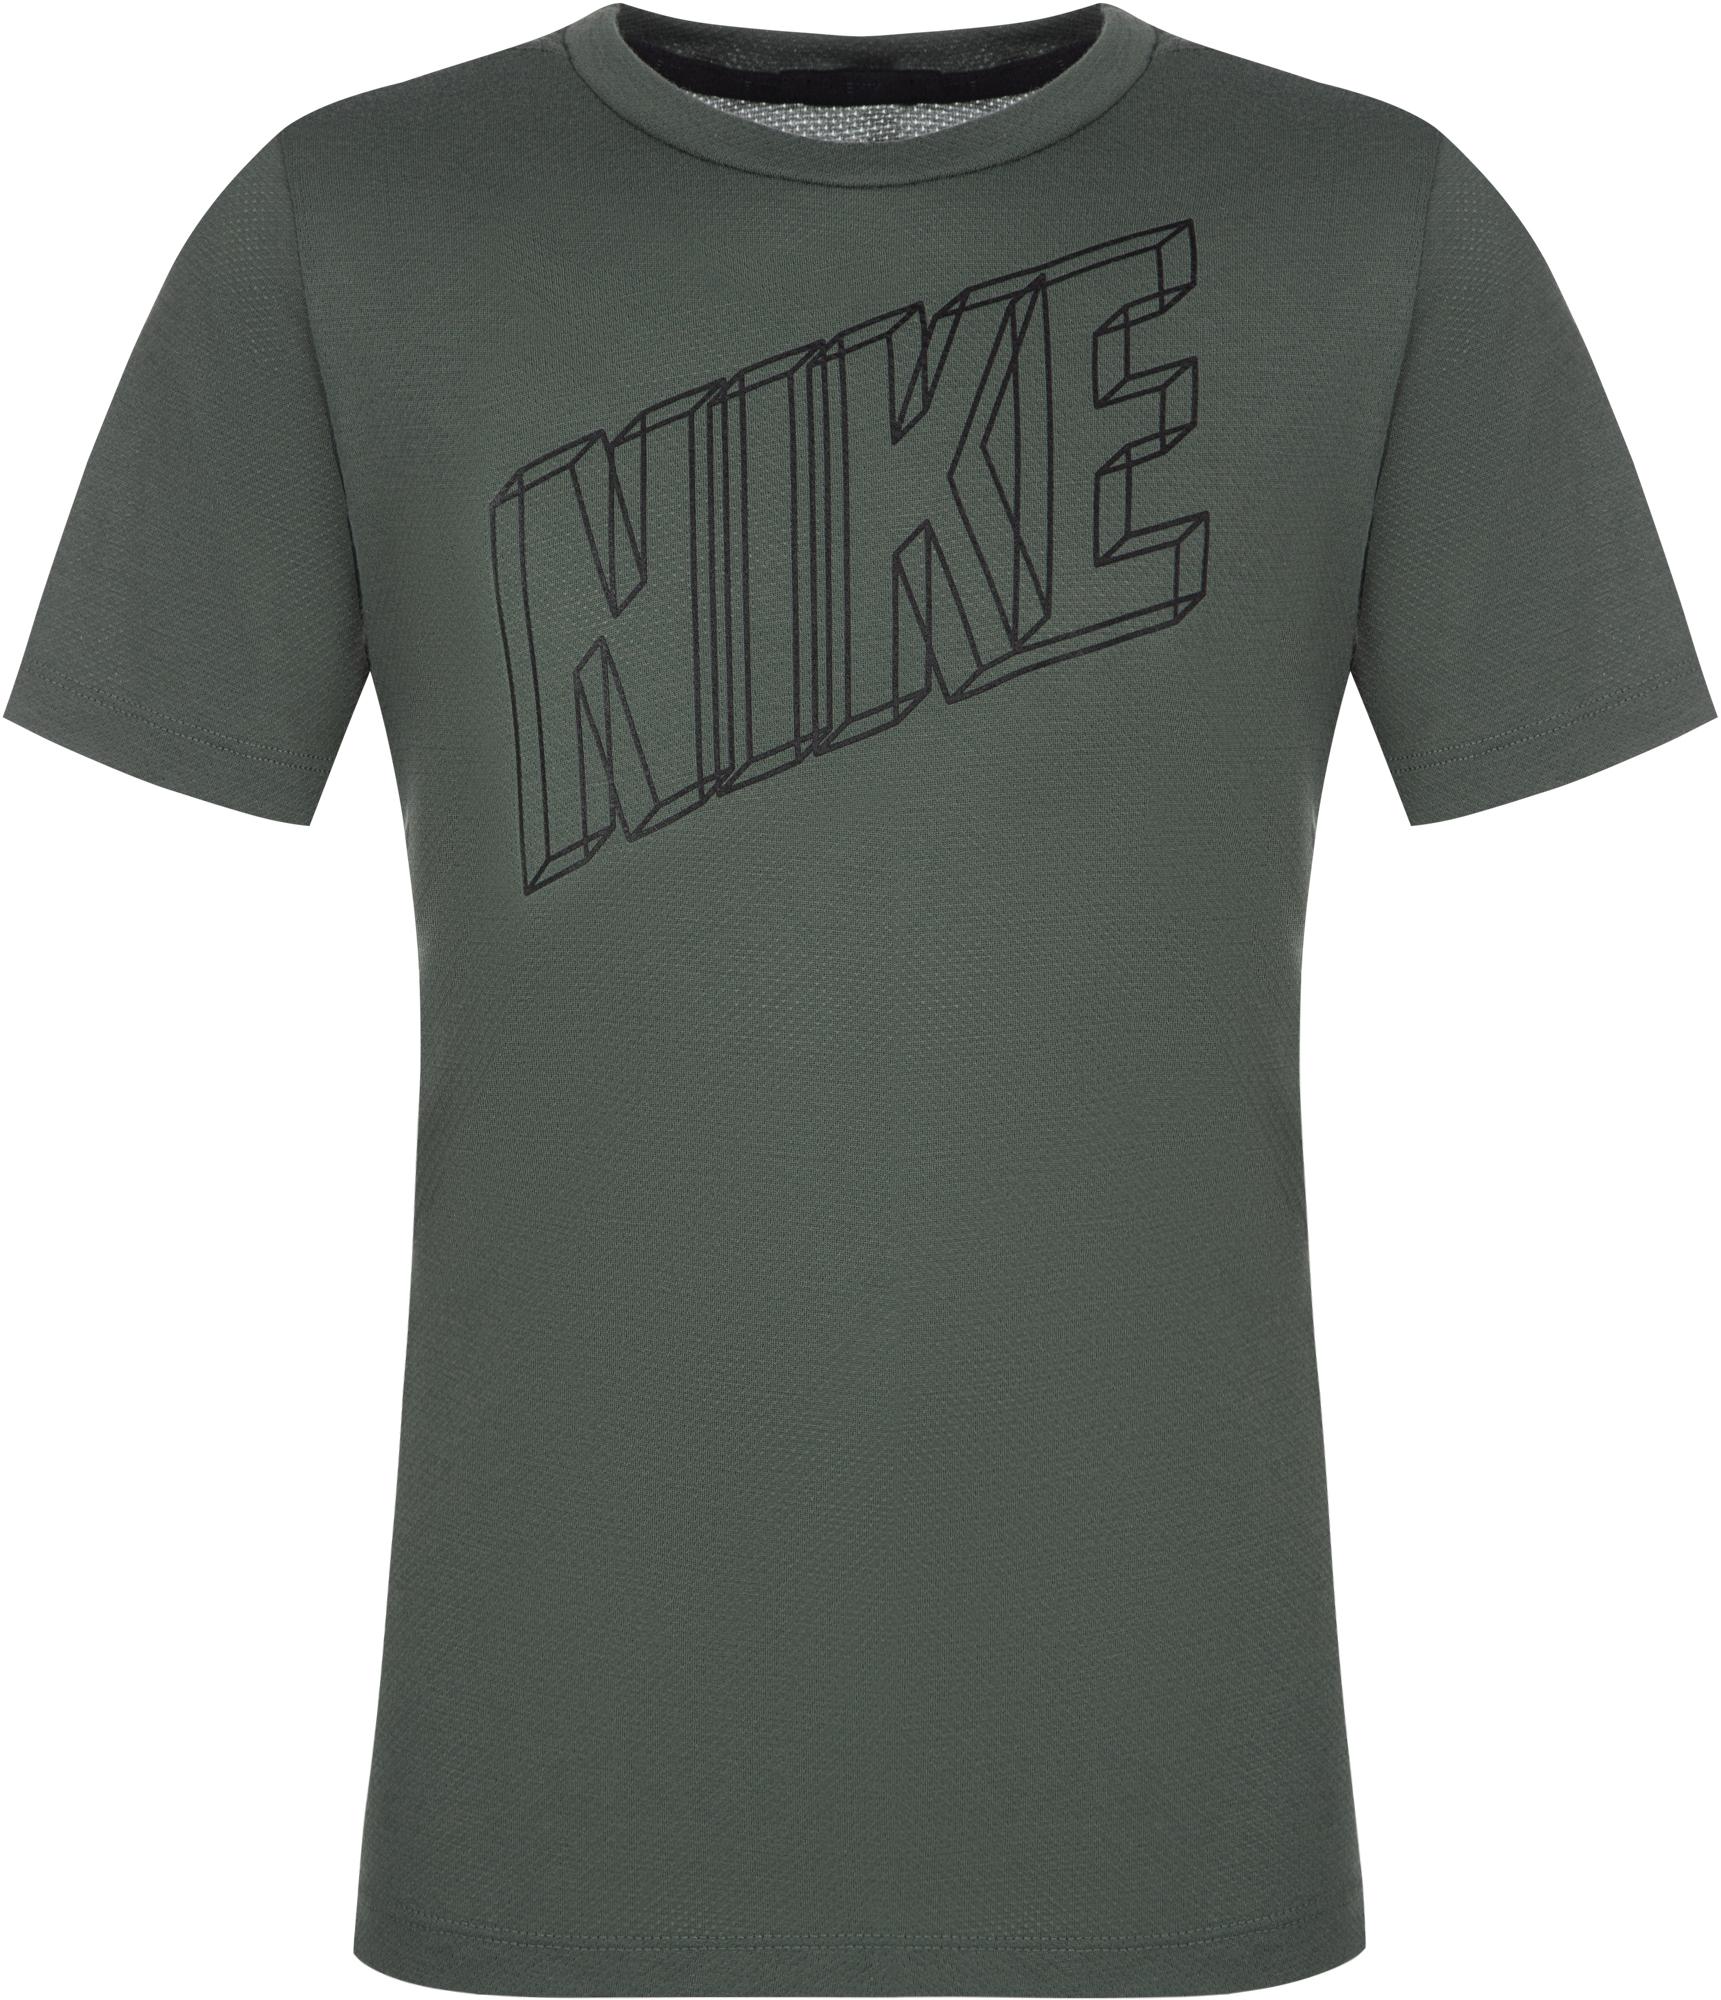 Nike Футболка для мальчиков Nike Breathe, размер 158-170